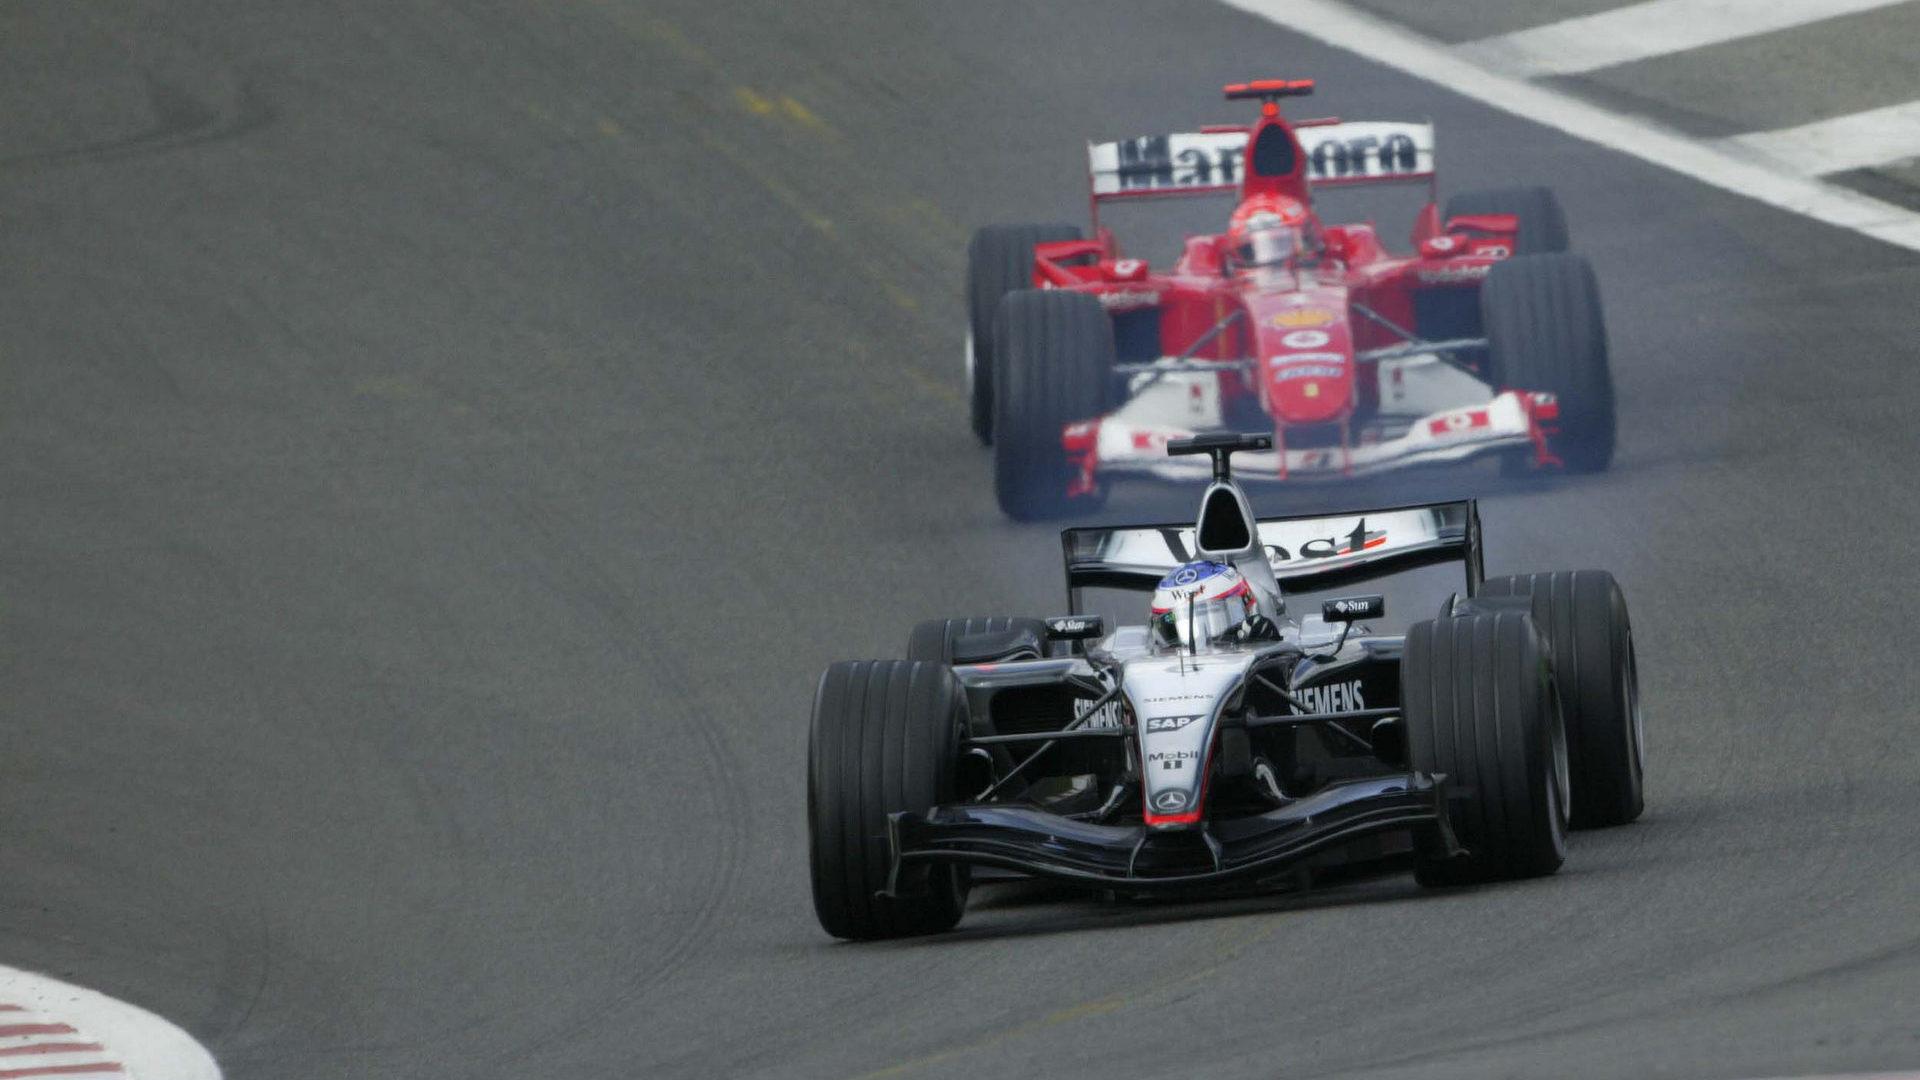 Hd Wallpapers 2004 Formula 1 Grand Prix Of Belgium F1